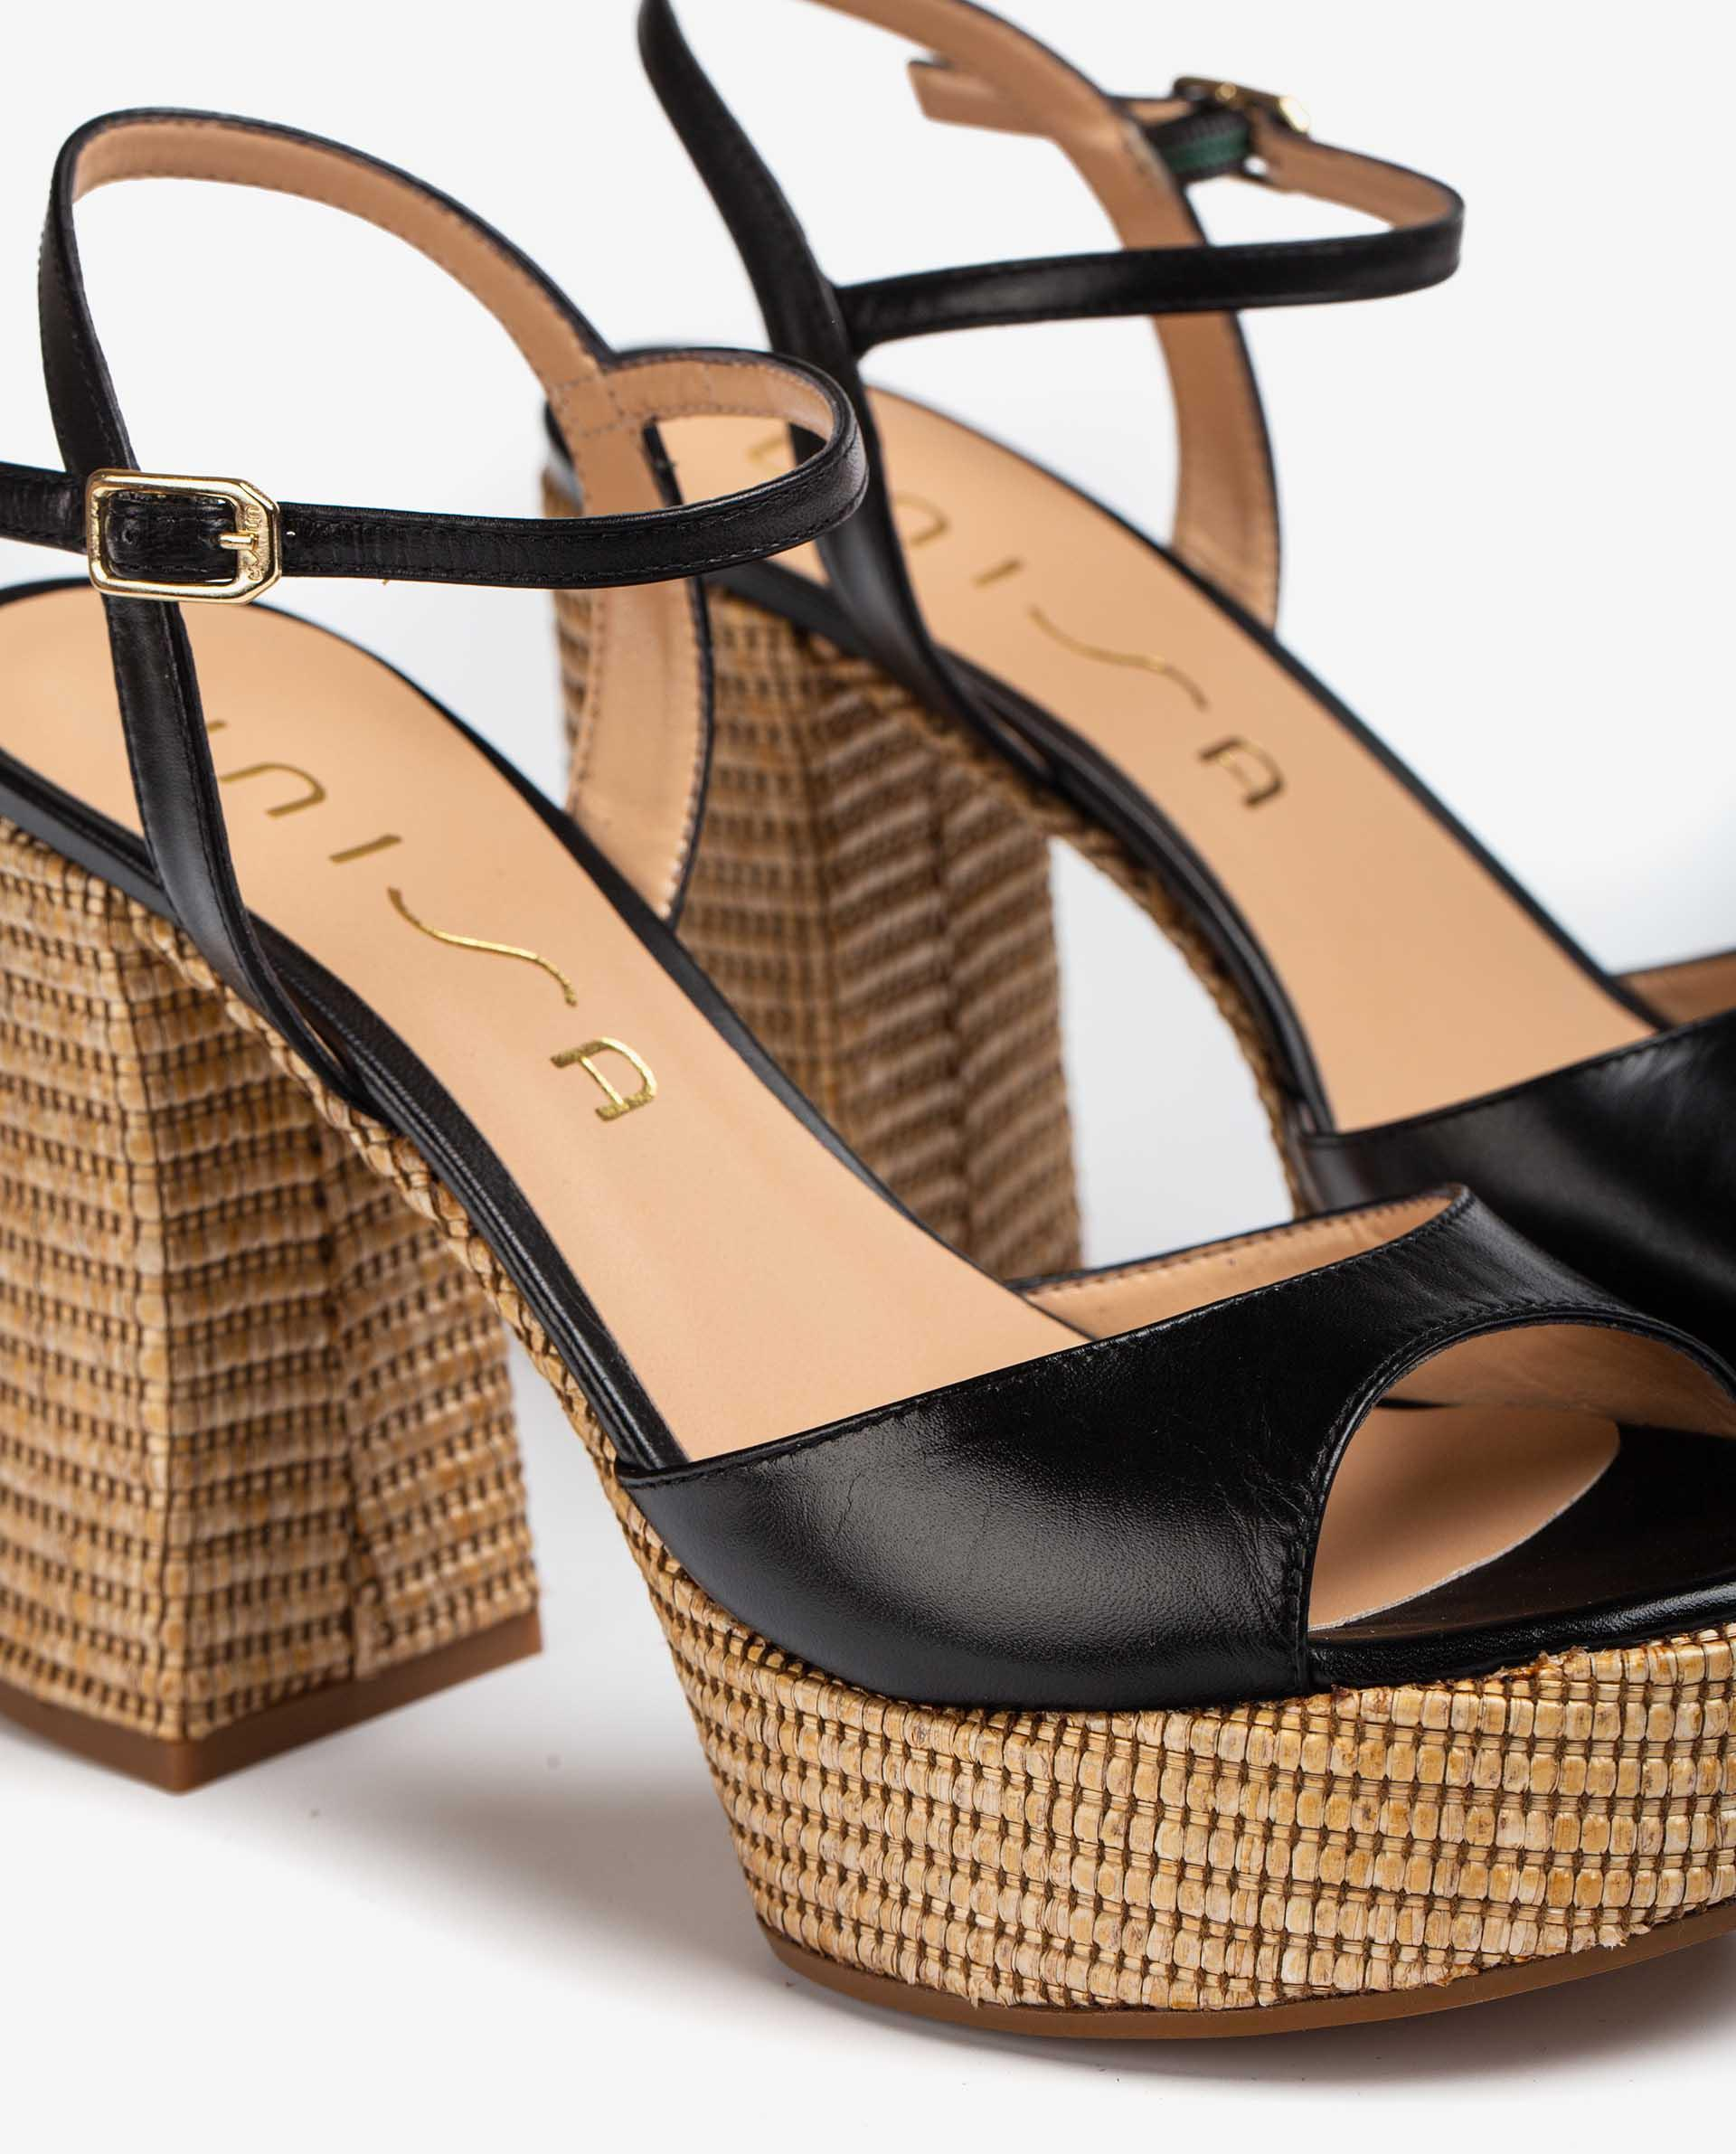 UNISA 70's style heel and platform sandals VEGARA_21_NA_RR 2